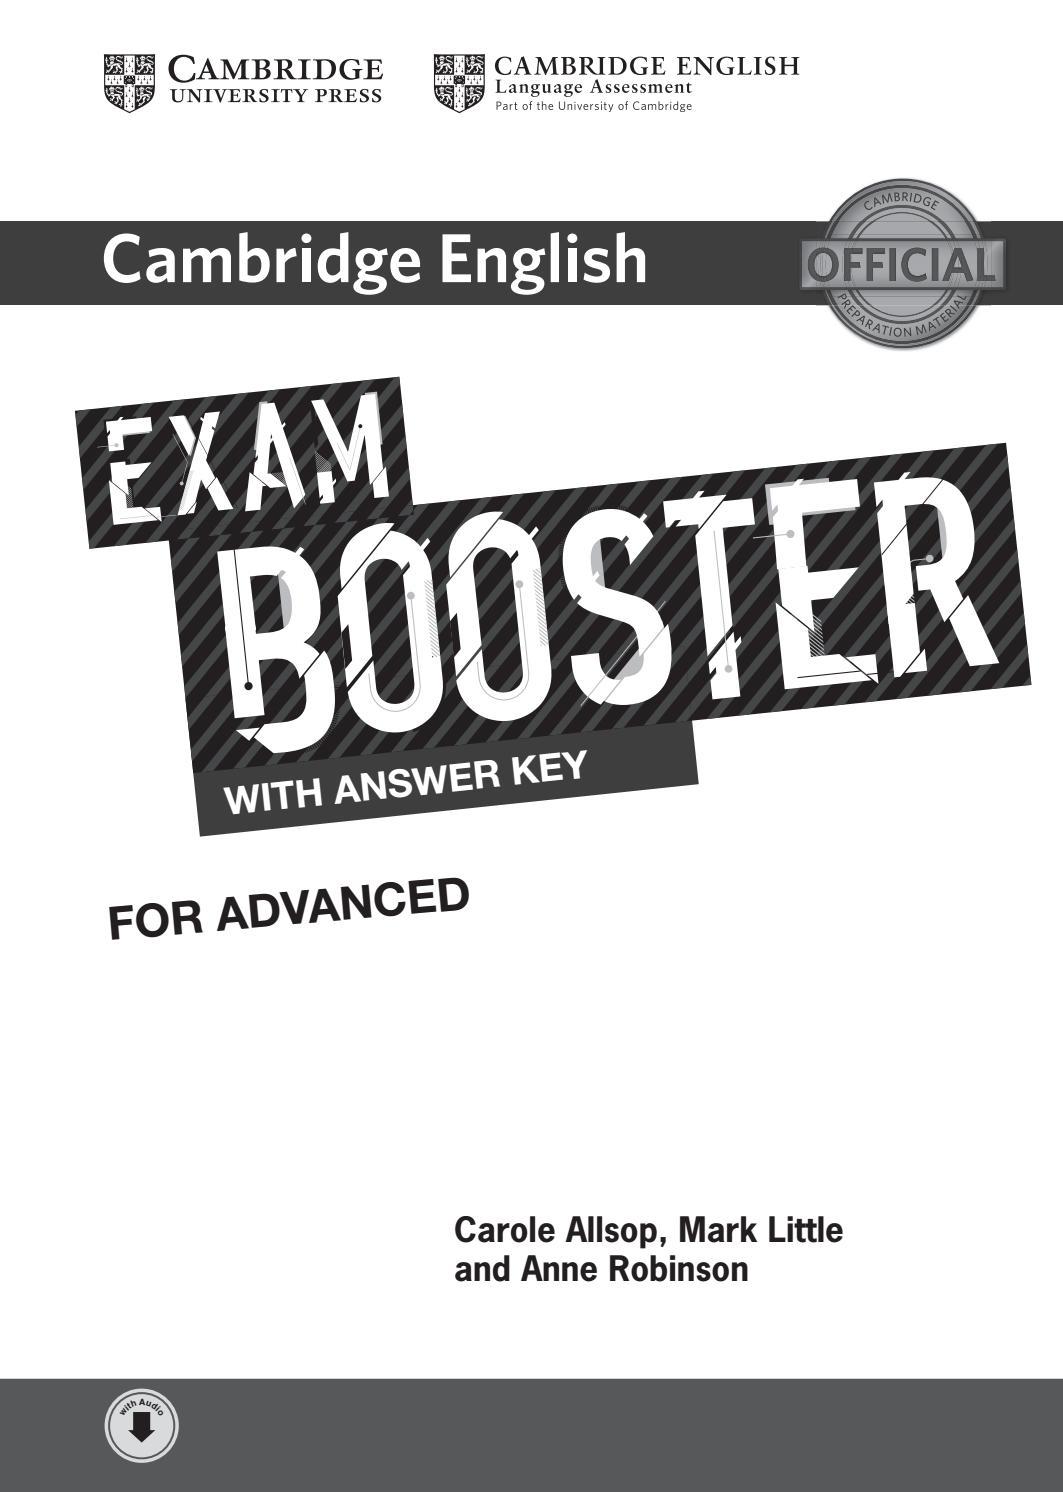 hight resolution of cae exam booster by annmargaretgarvin - issuu